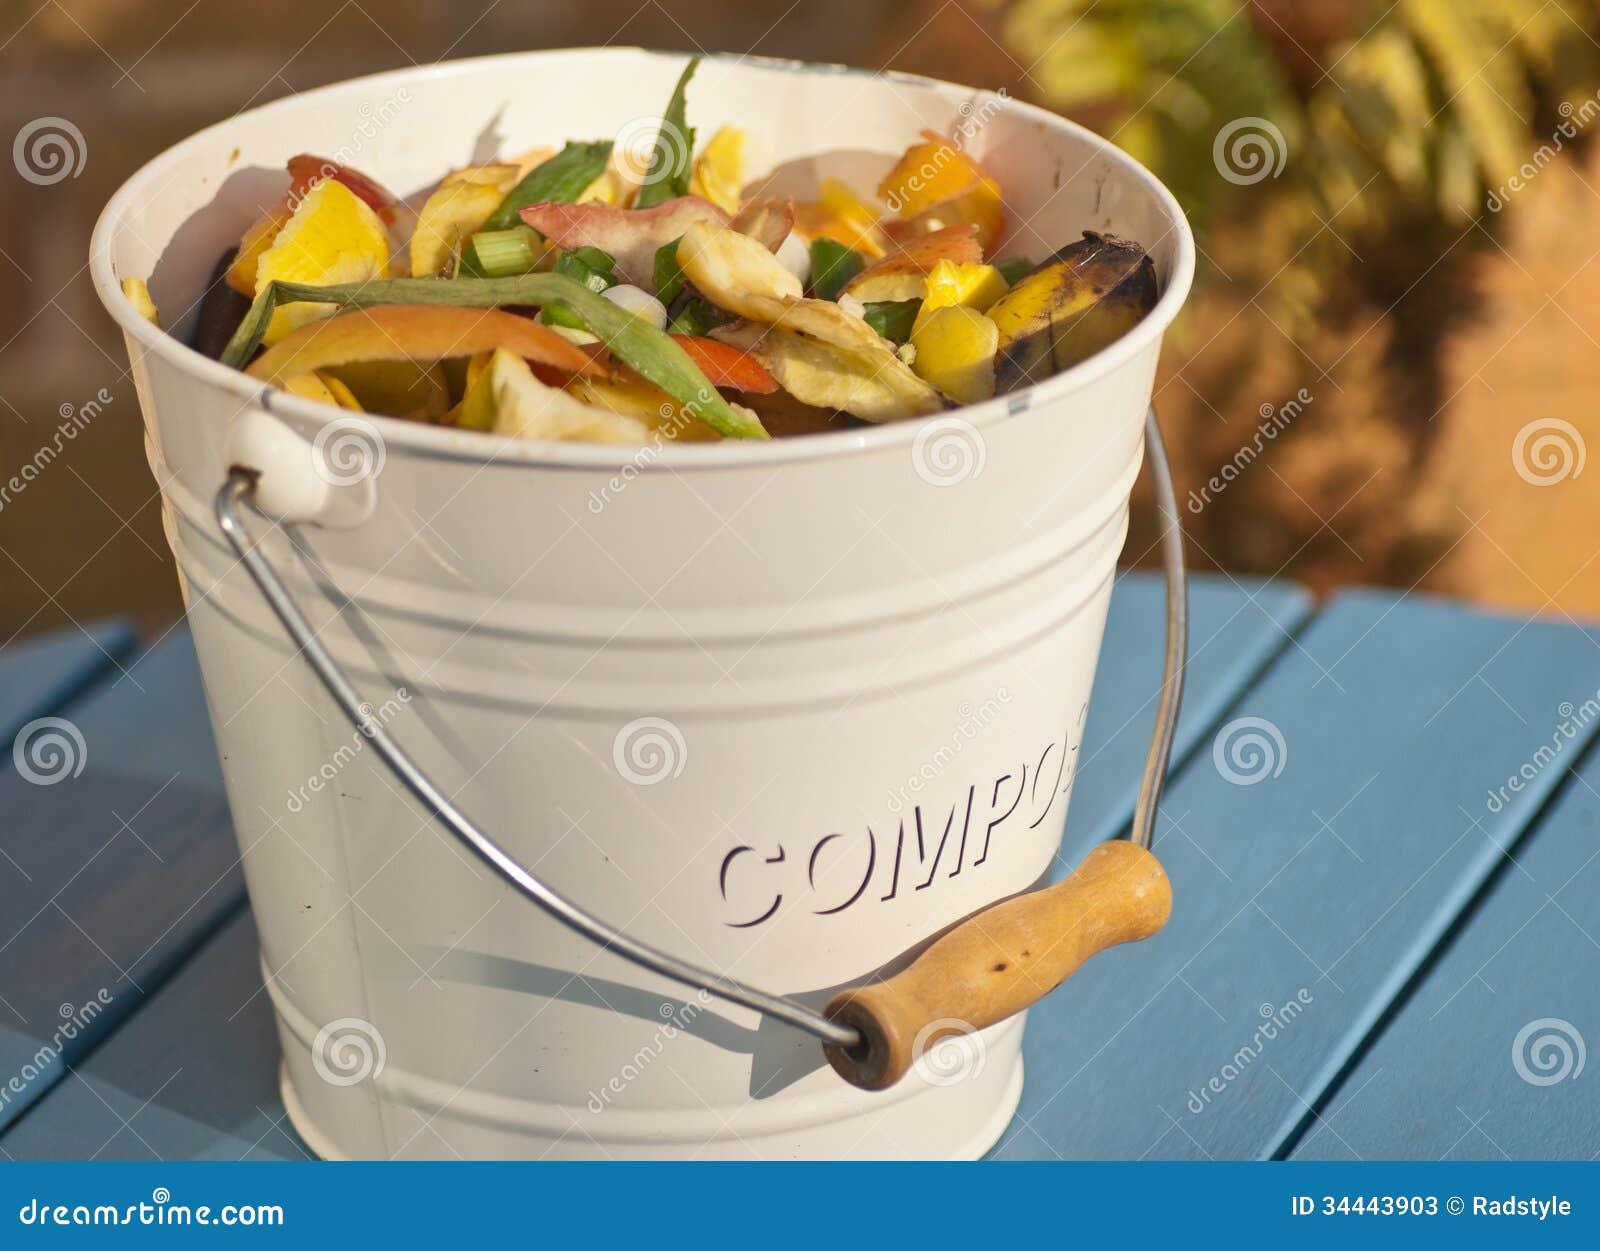 kompost-eimer stockfotos - bild: 34443903